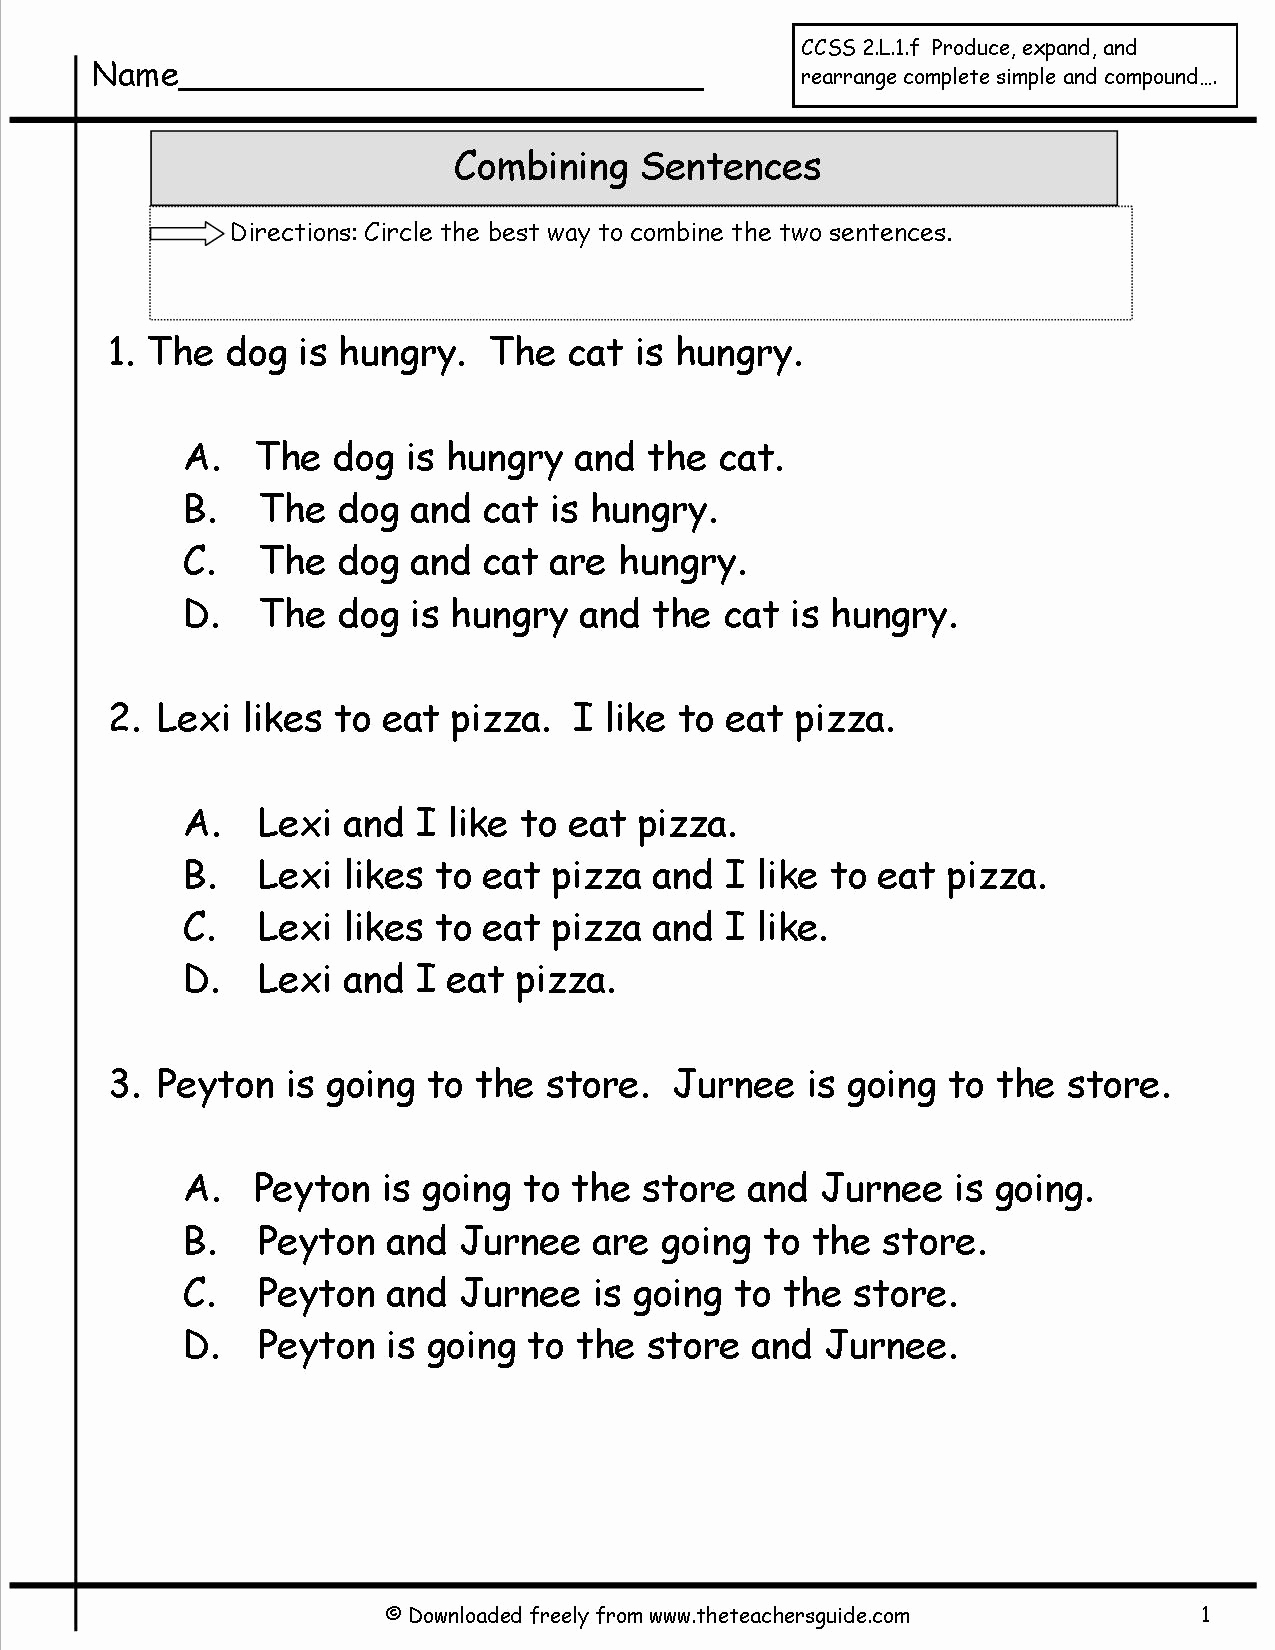 Combining Sentences Worksheets 5th Grade Fresh 20 Bining Sentences Worksheets 5th Grade